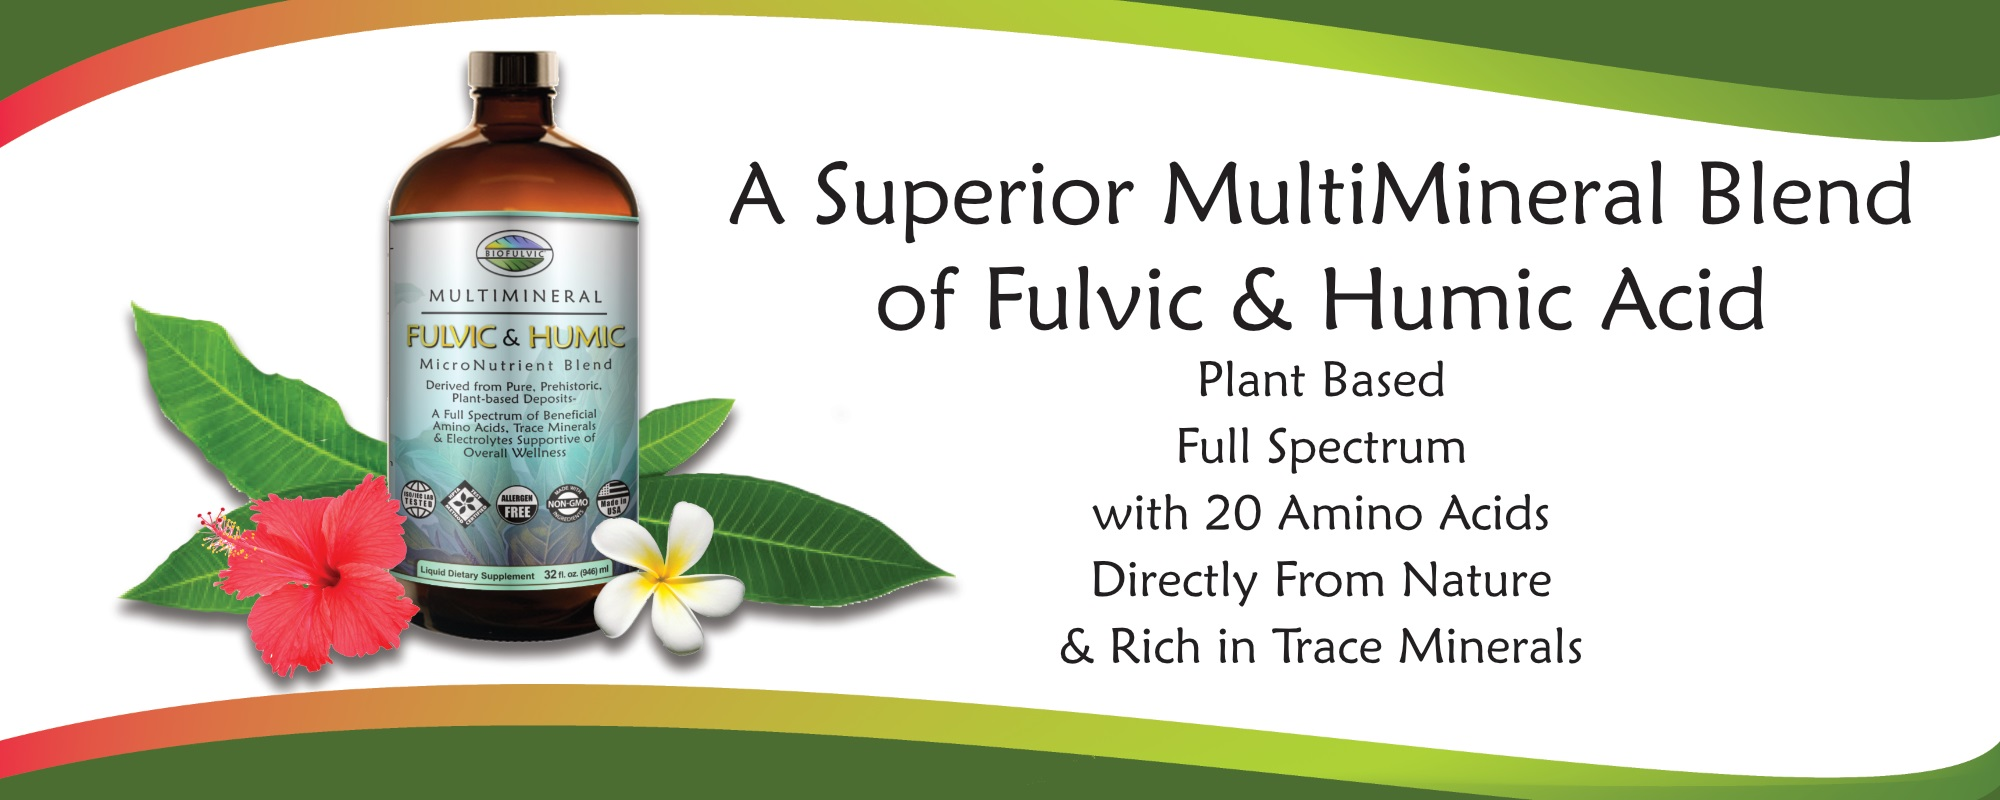 Biofulvic Supplements